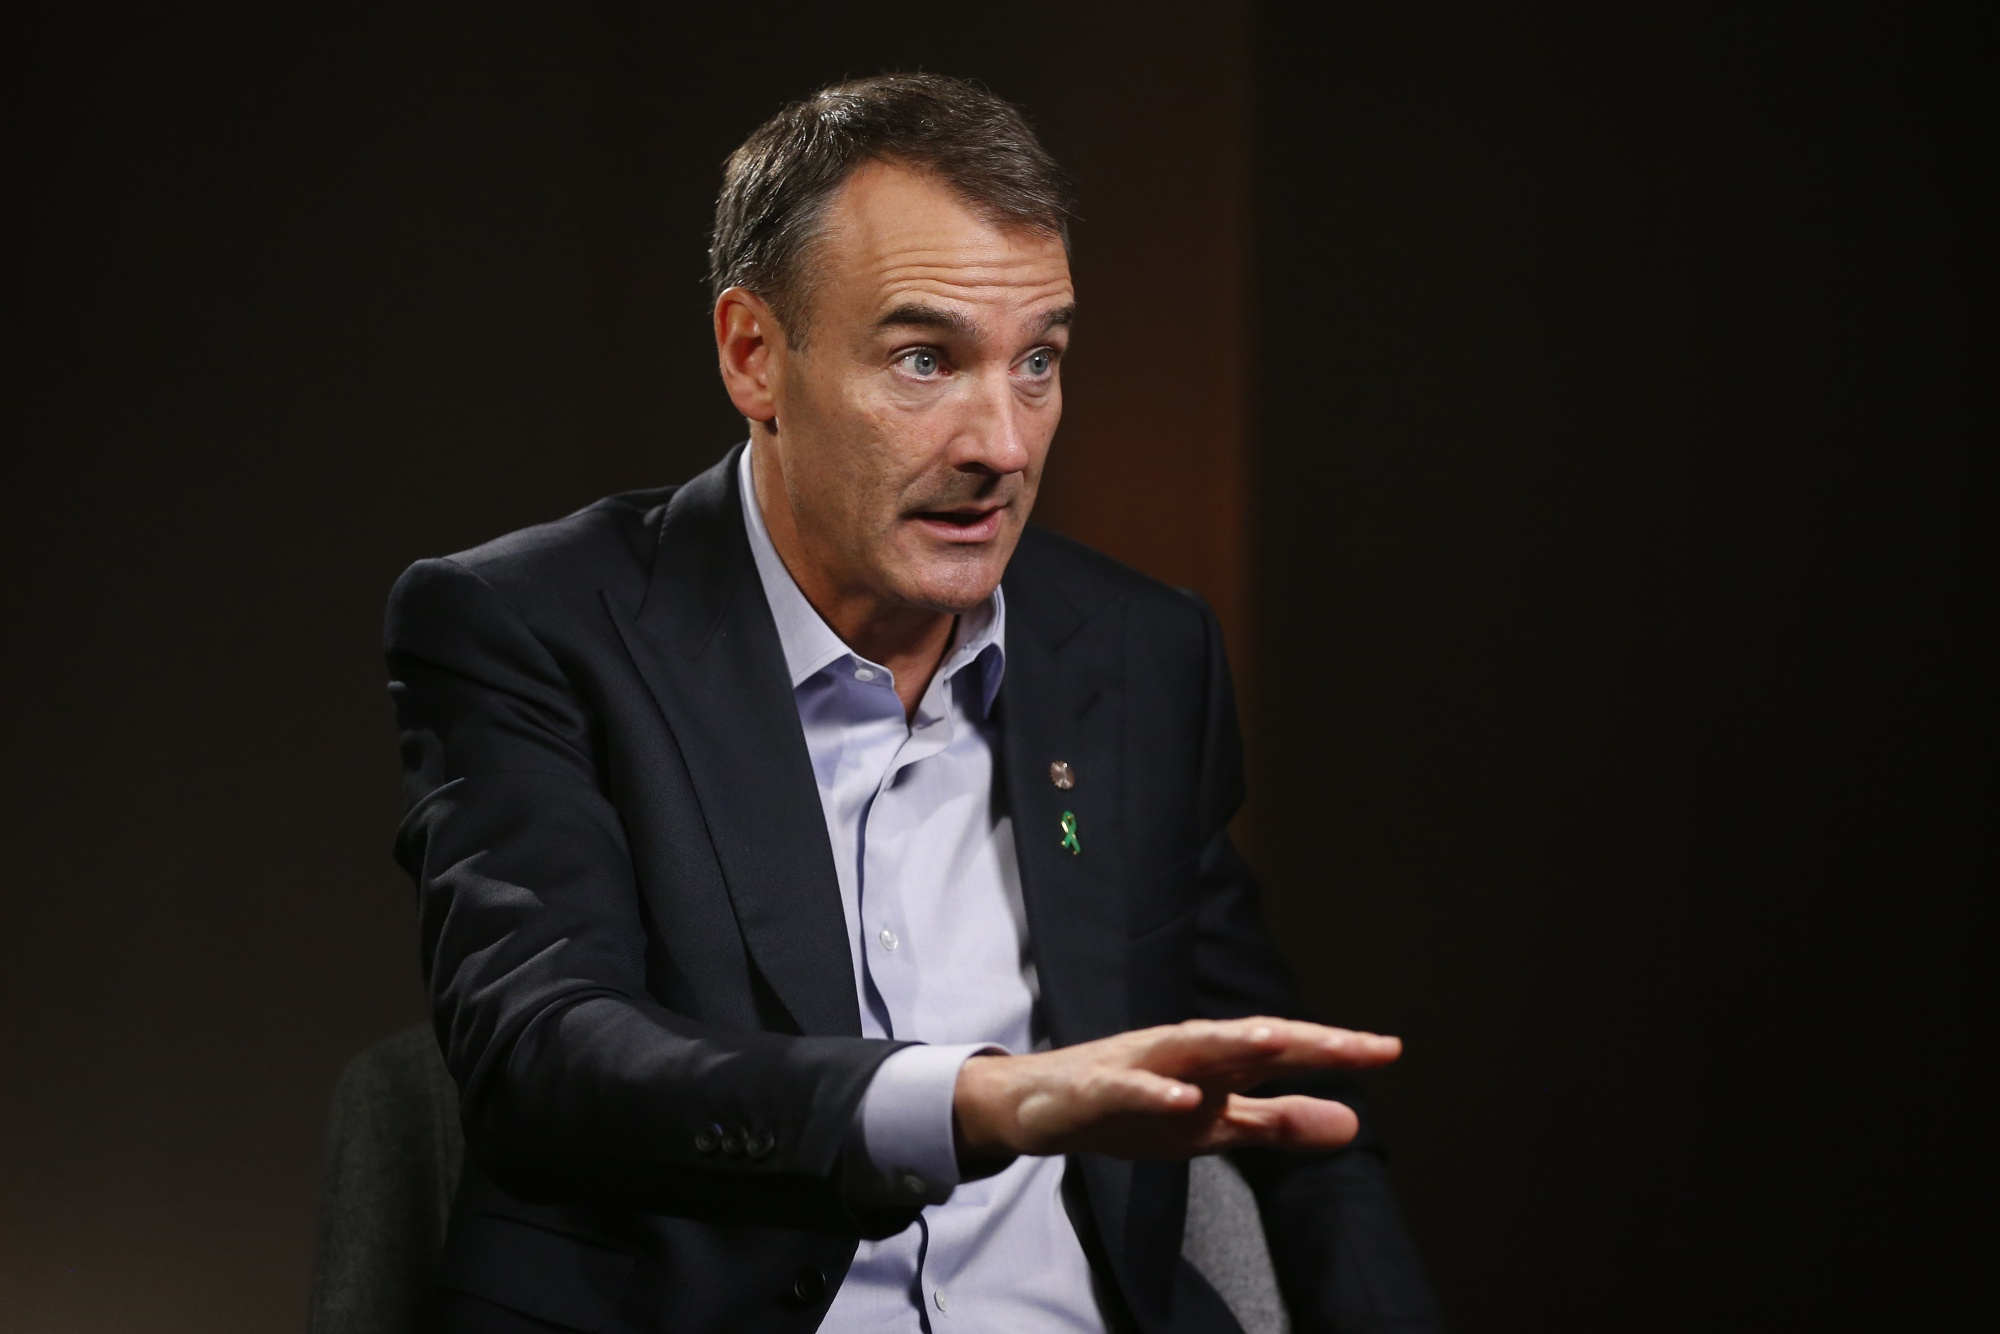 BP Plc CEO Bernard Looney Sets Out His Vision